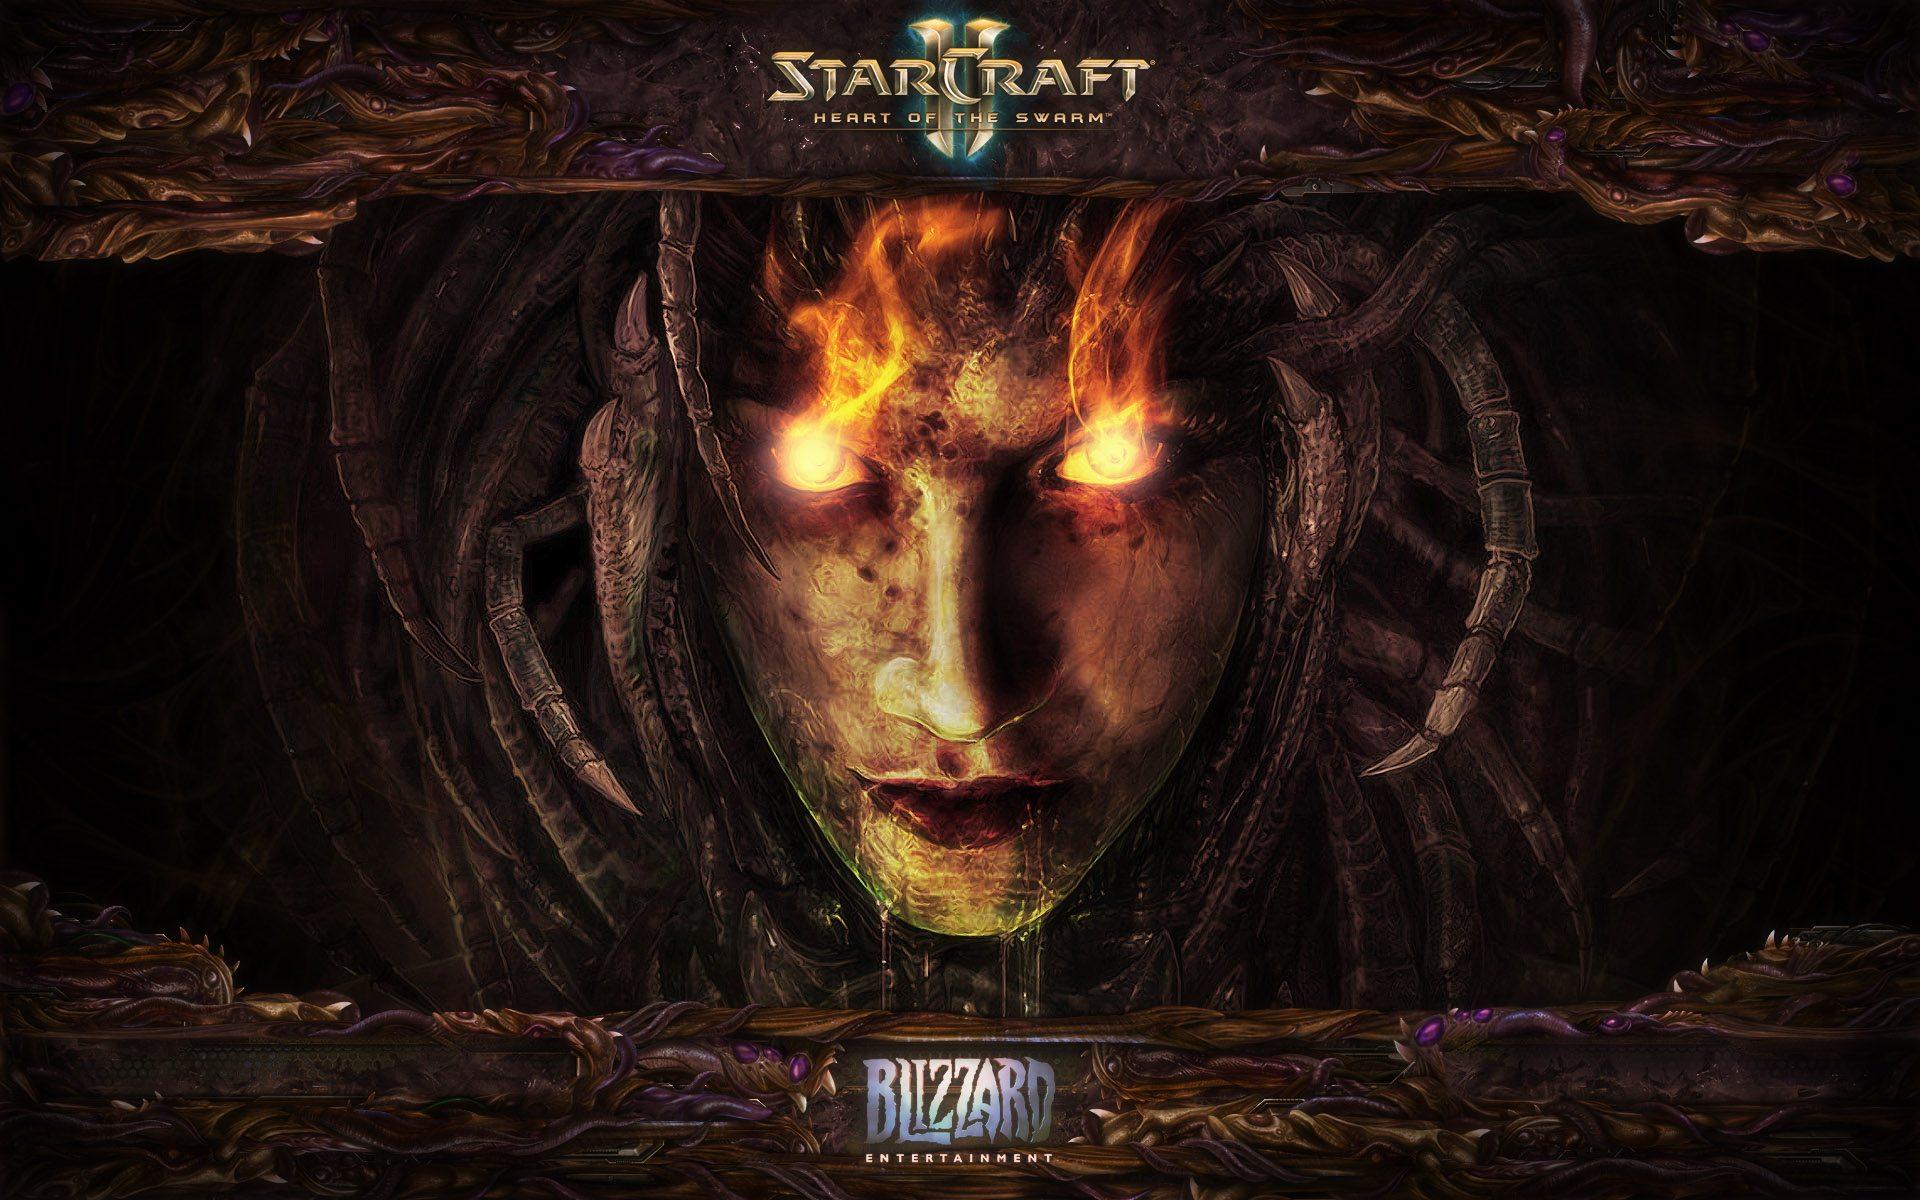 Free Download Sarah Kerrigan Starcraft 2 Heart Of The Swarm